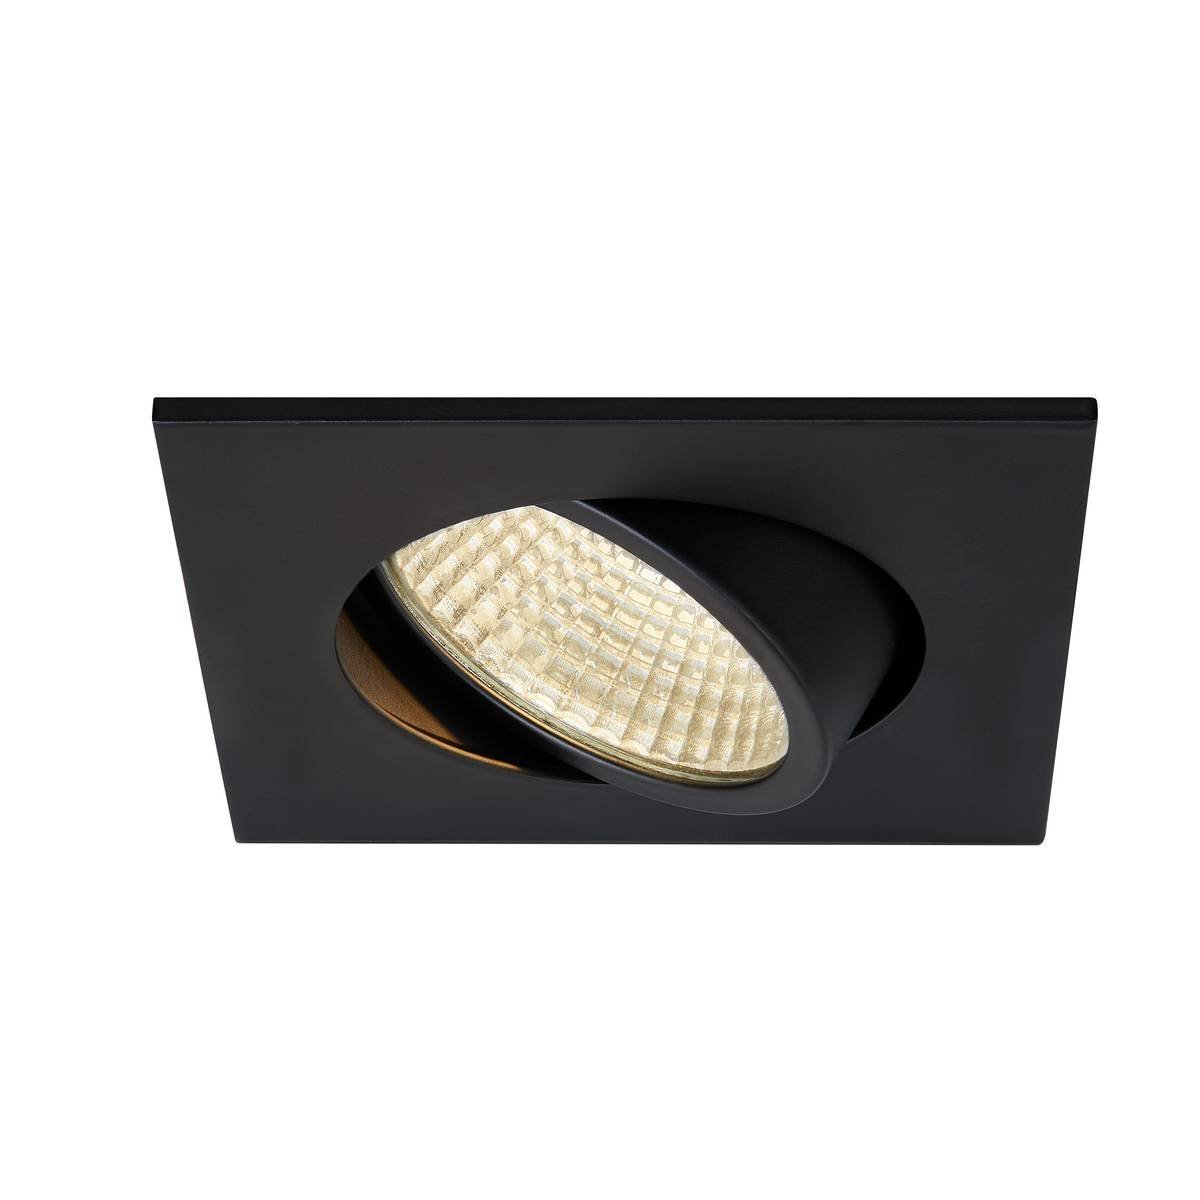 SLV – verlichting New Tria 68 1003061 | 4024163232500